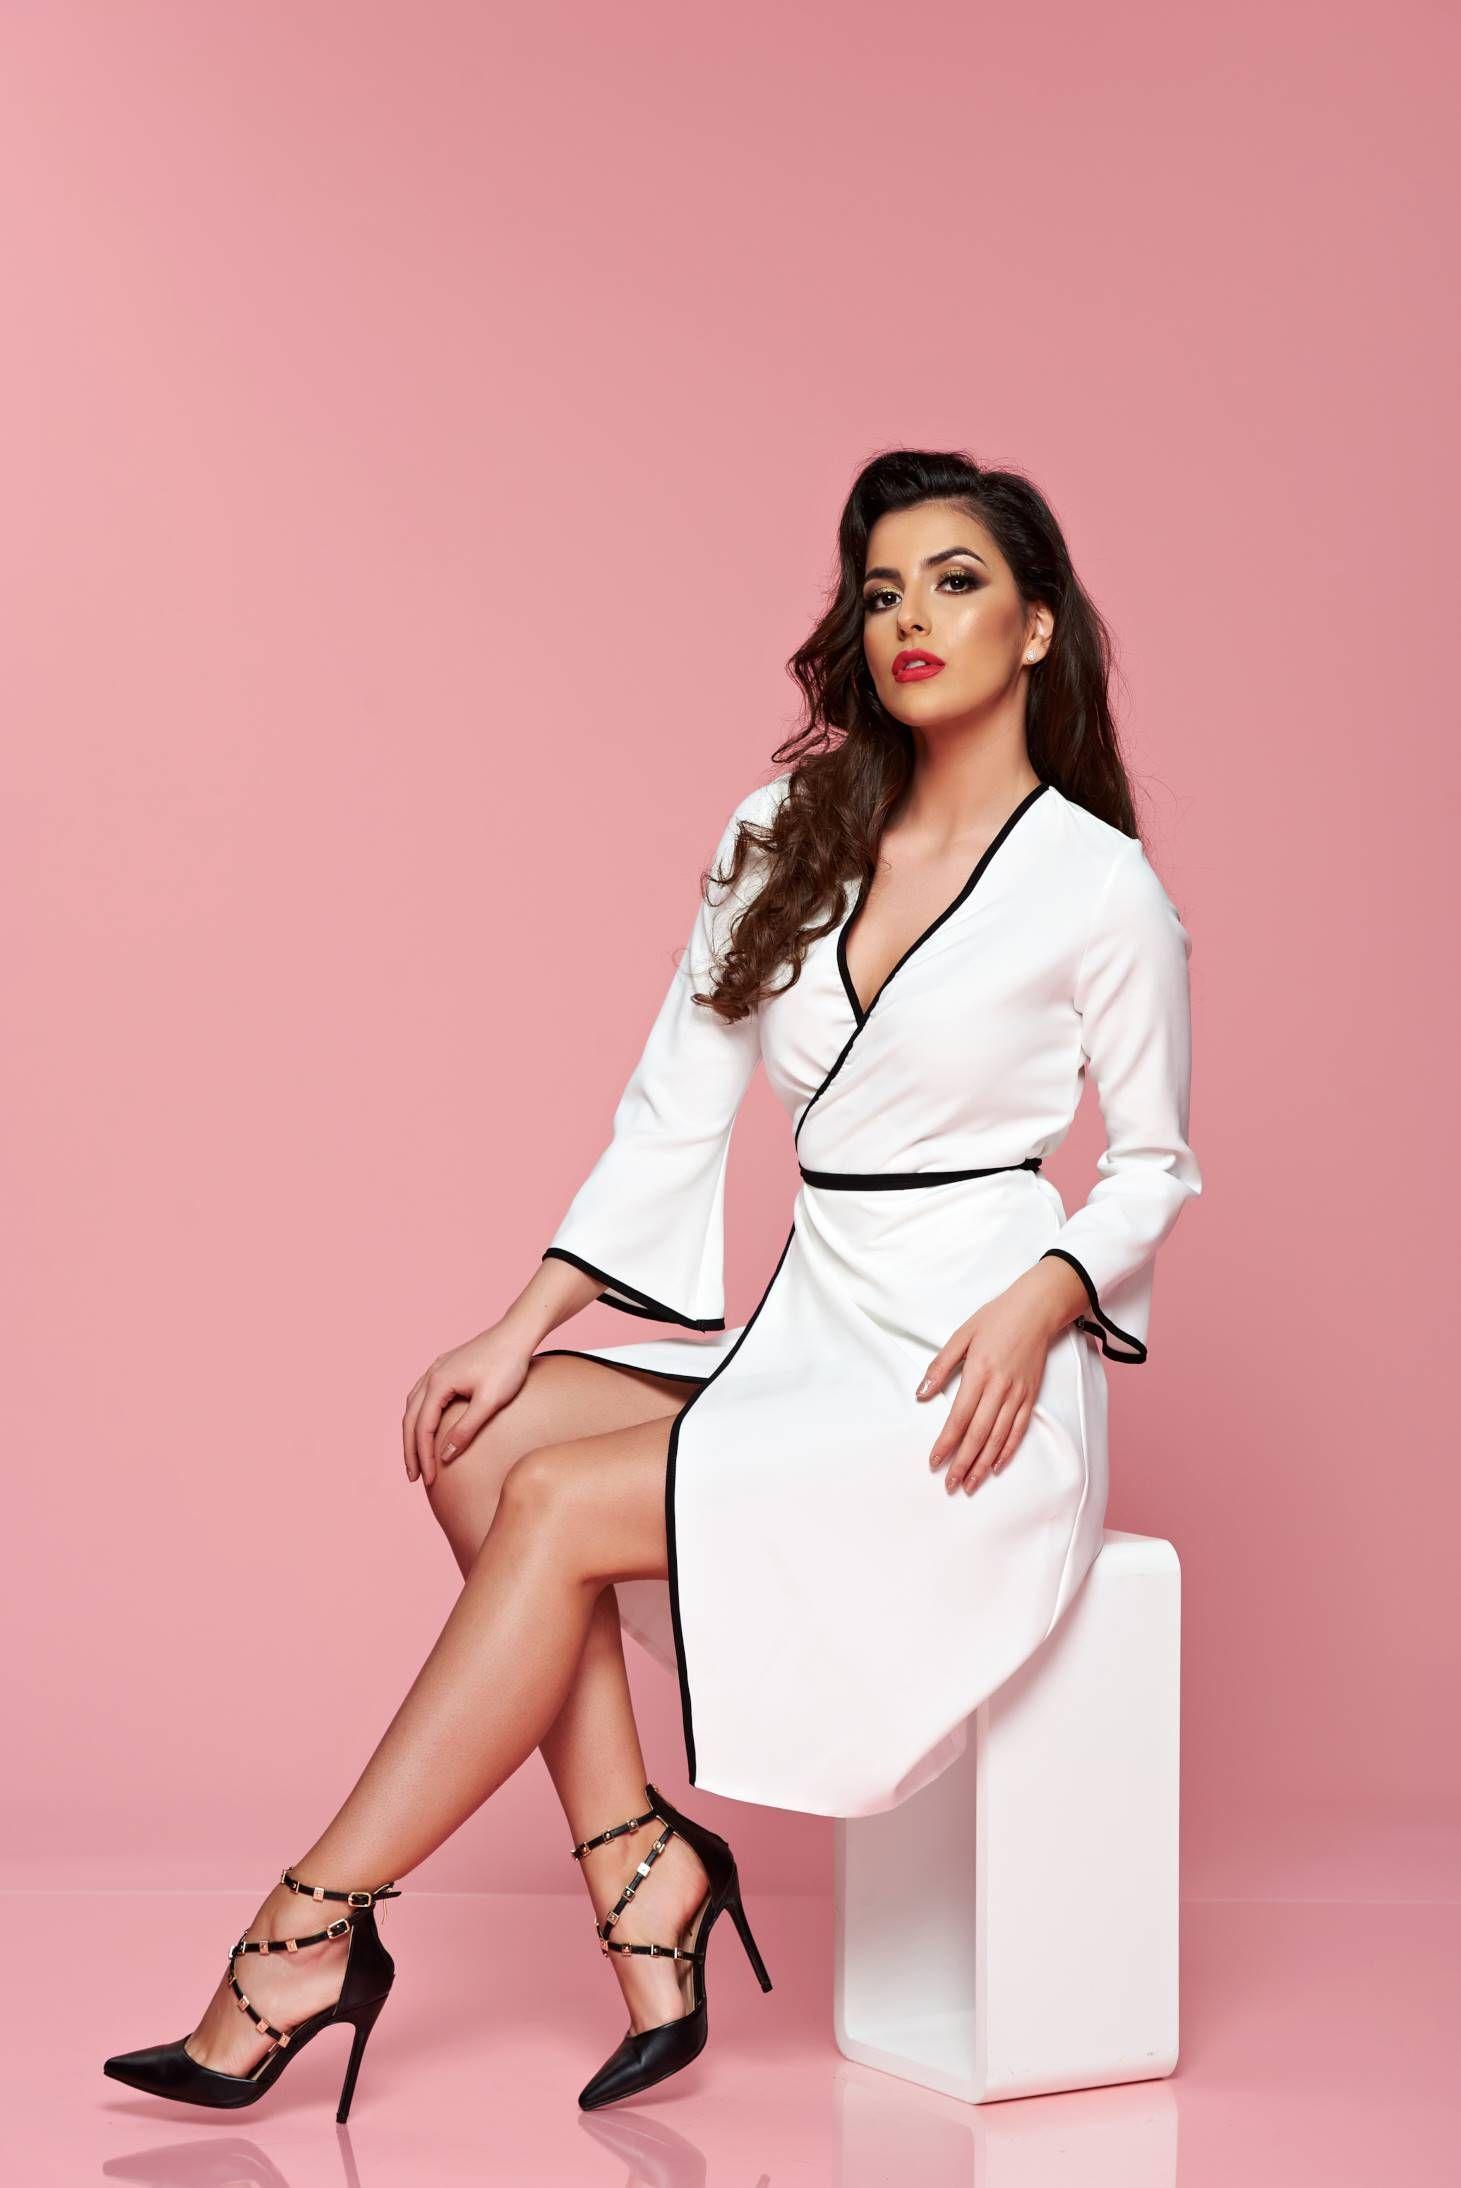 Starshiners Prettygirl White Wrap Around Dress With 3 4 Sleeves S028753 2 Wrap Around Dress Fashion Mini Dress [ 2188 x 1461 Pixel ]